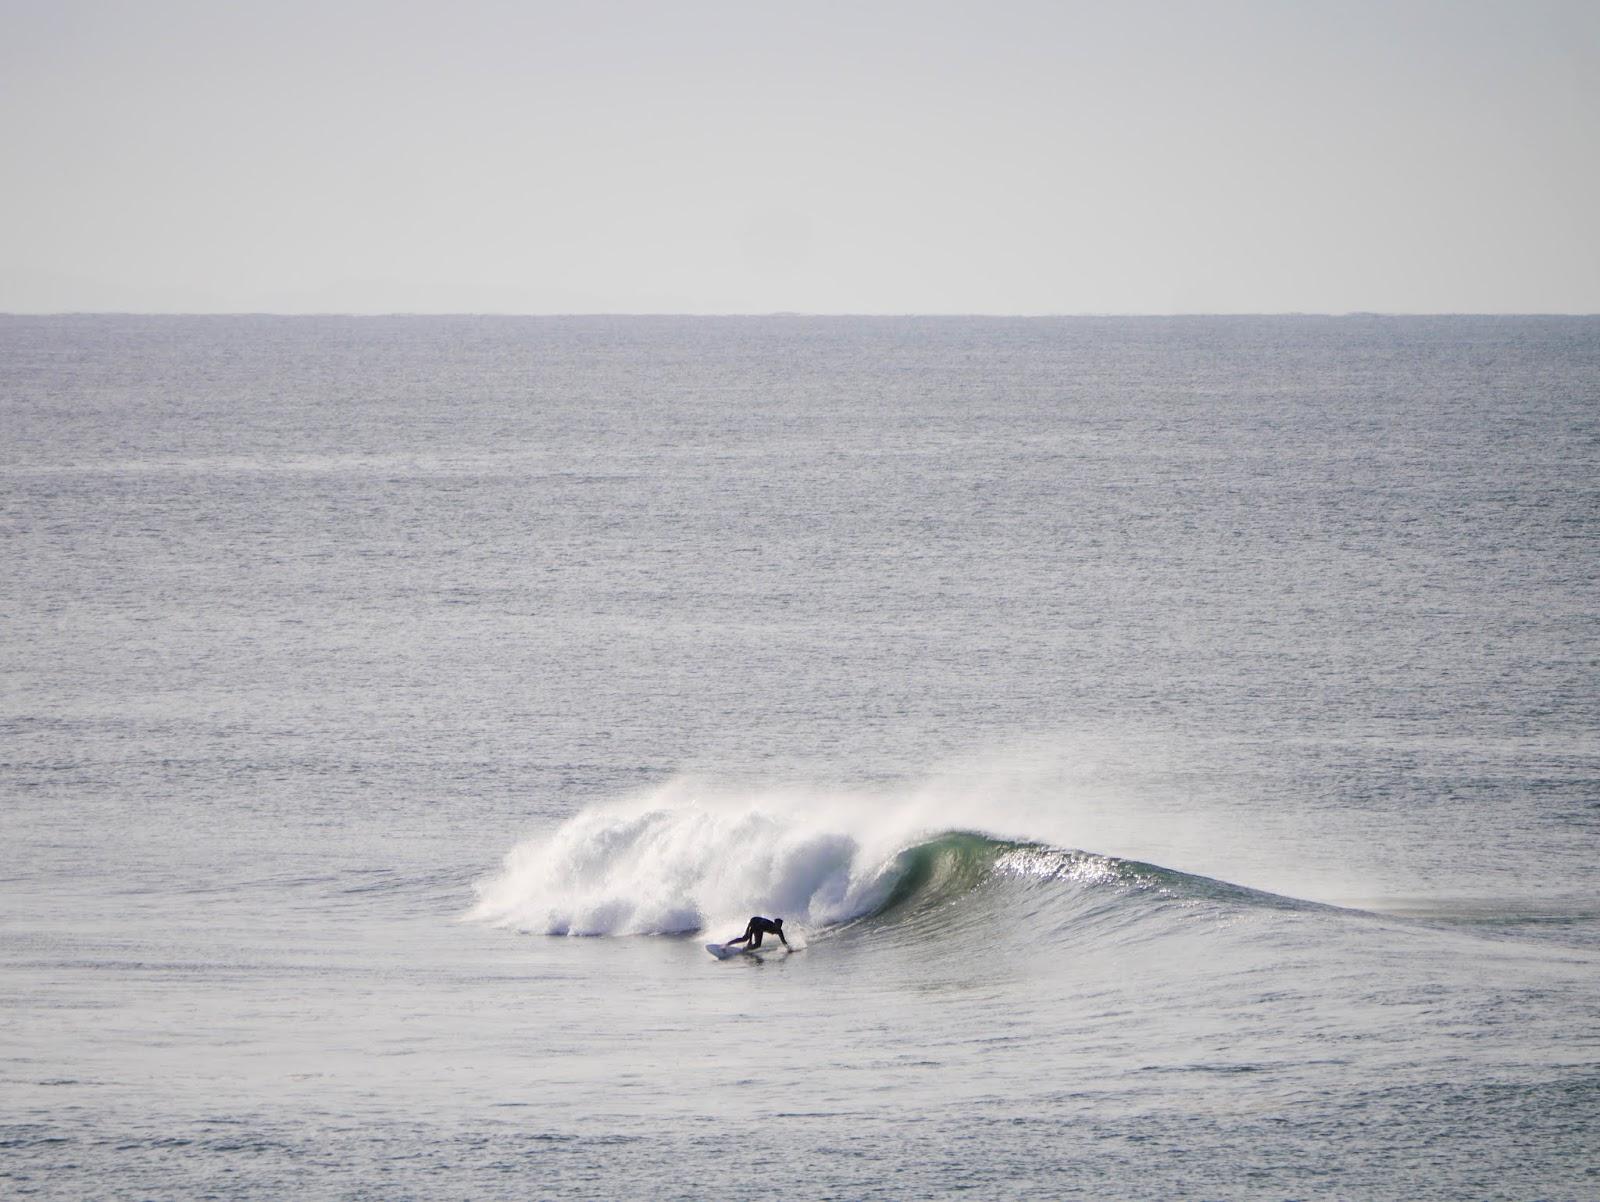 Surfinestate surf surfboard twinfin fish culture shop brand apparel clothing shape handshape Vincent Lemanceau Arthur Nelli Steve Lis Mark Richards Torren Martyn Asher Pacey Derrick Disney Ryan Burch